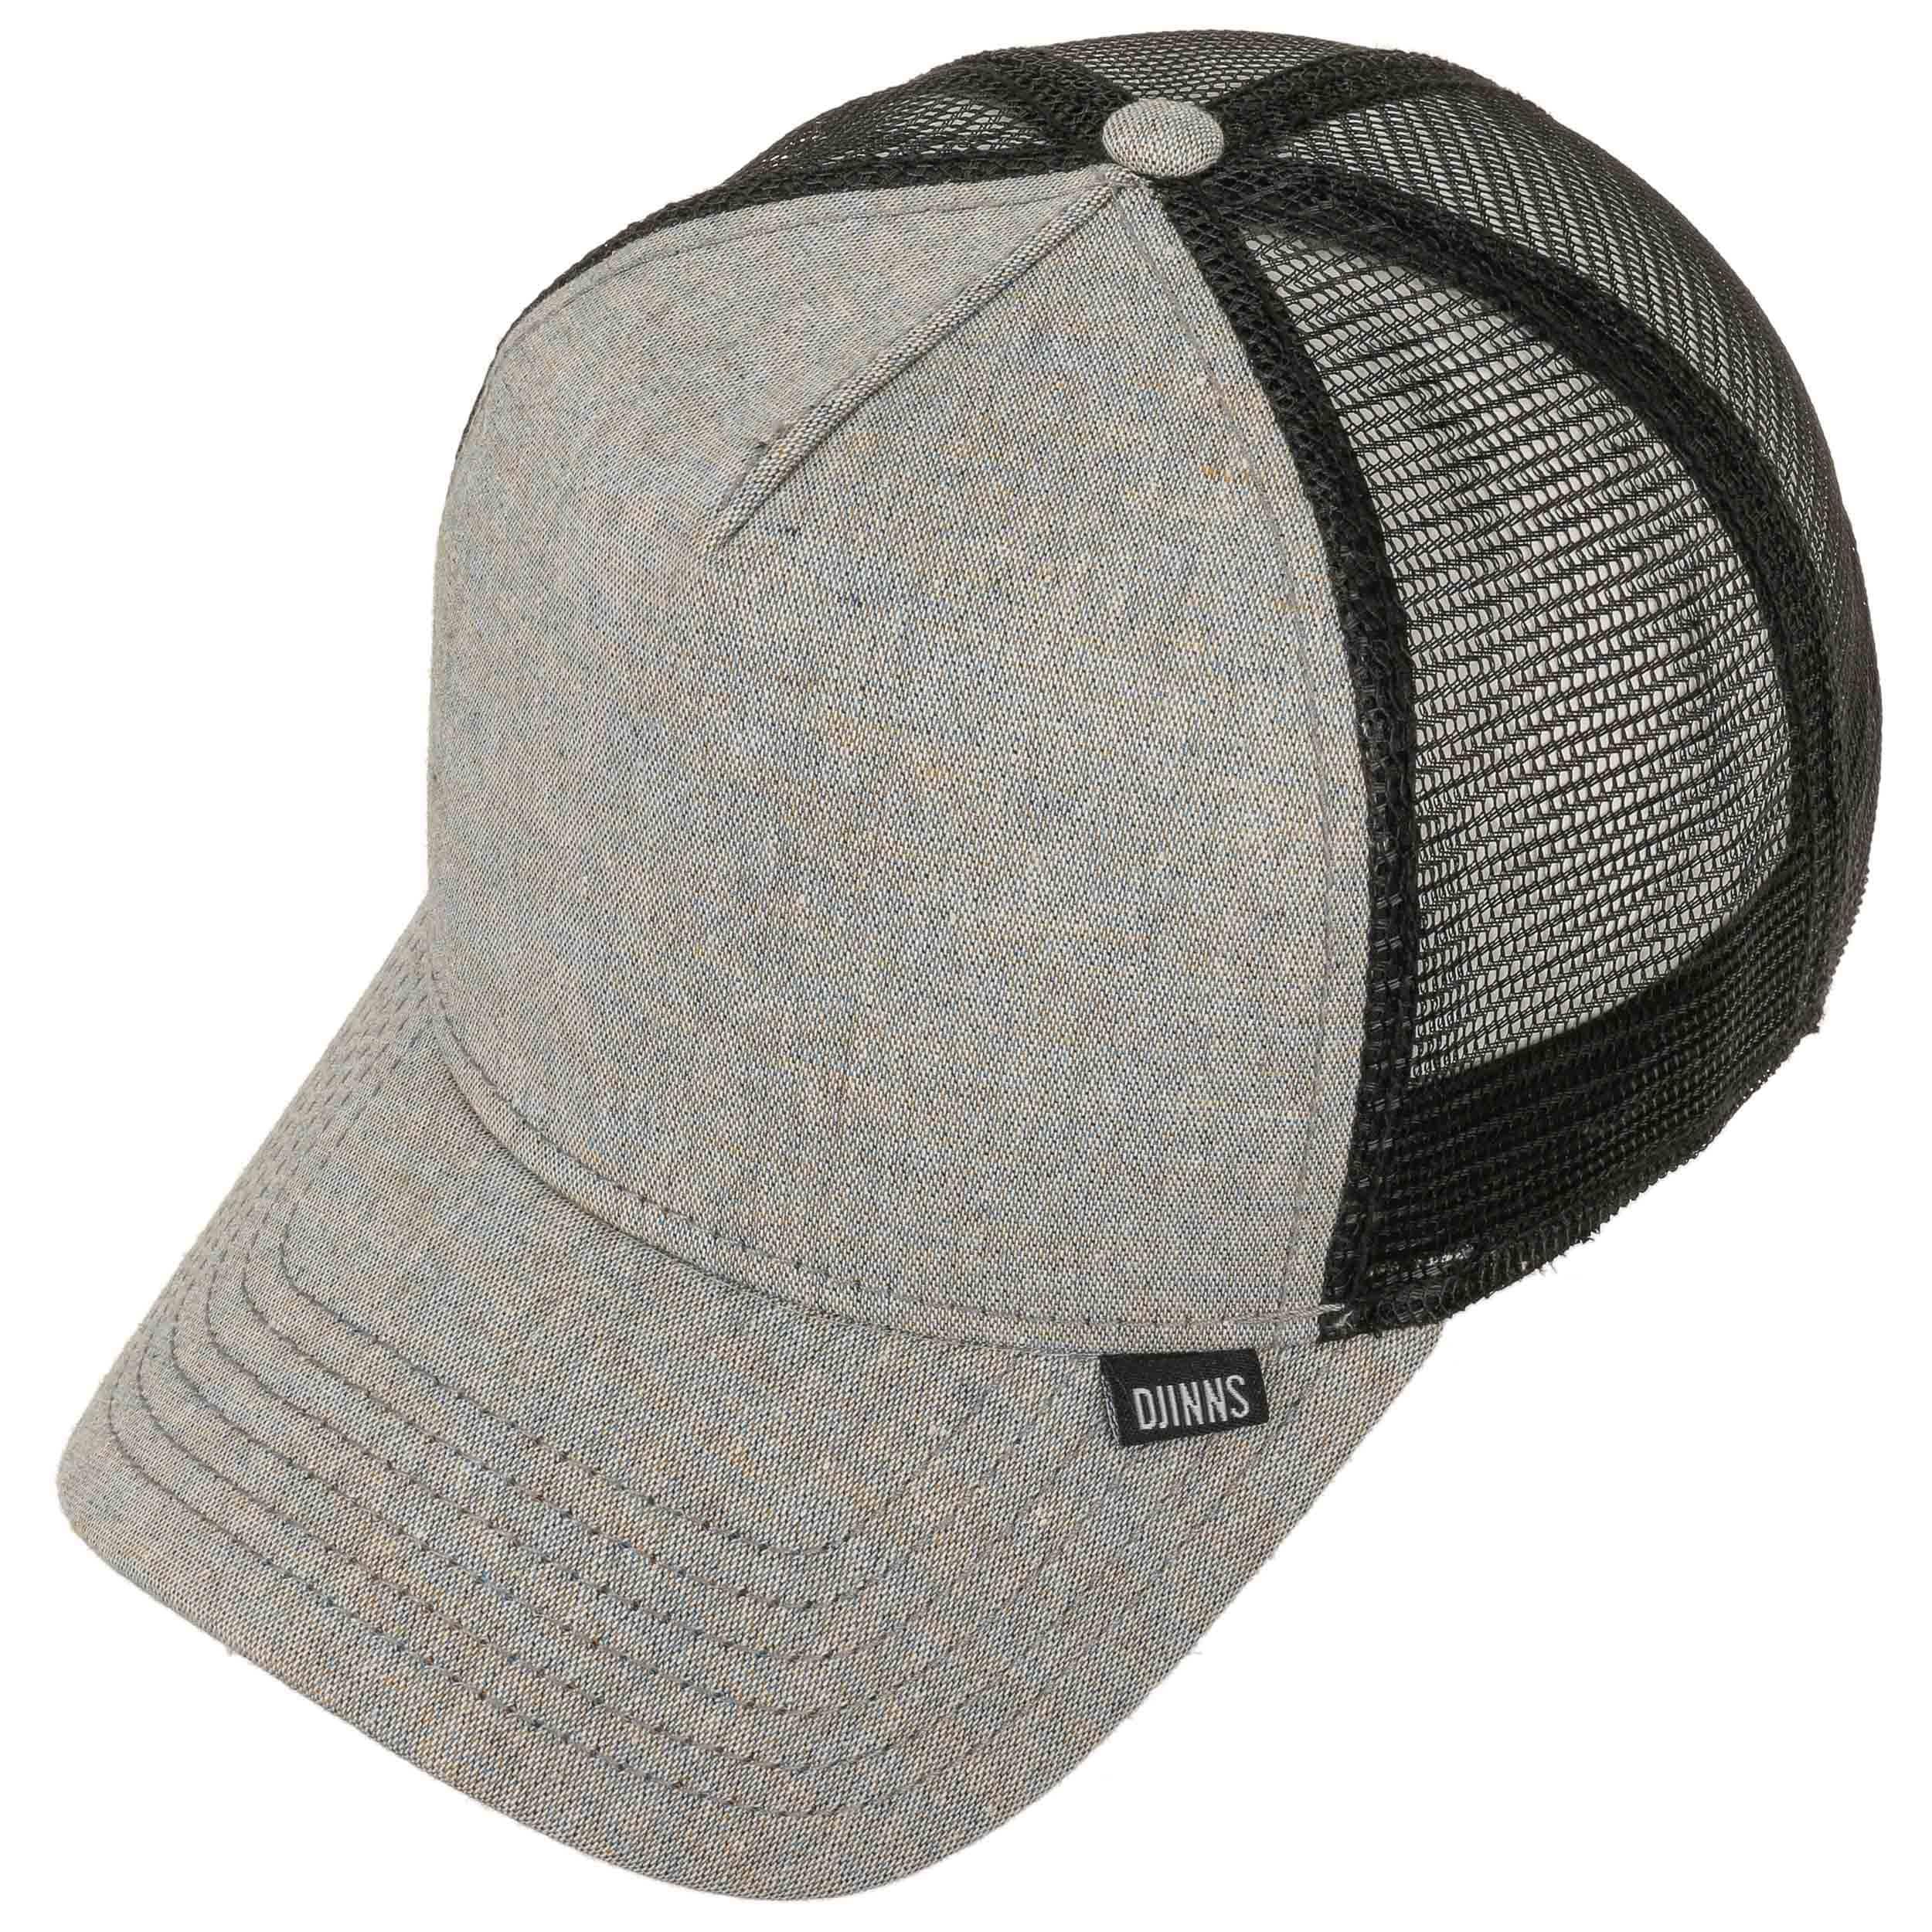 change hft trucker cap by djinns eur 21 99 hats caps. Black Bedroom Furniture Sets. Home Design Ideas